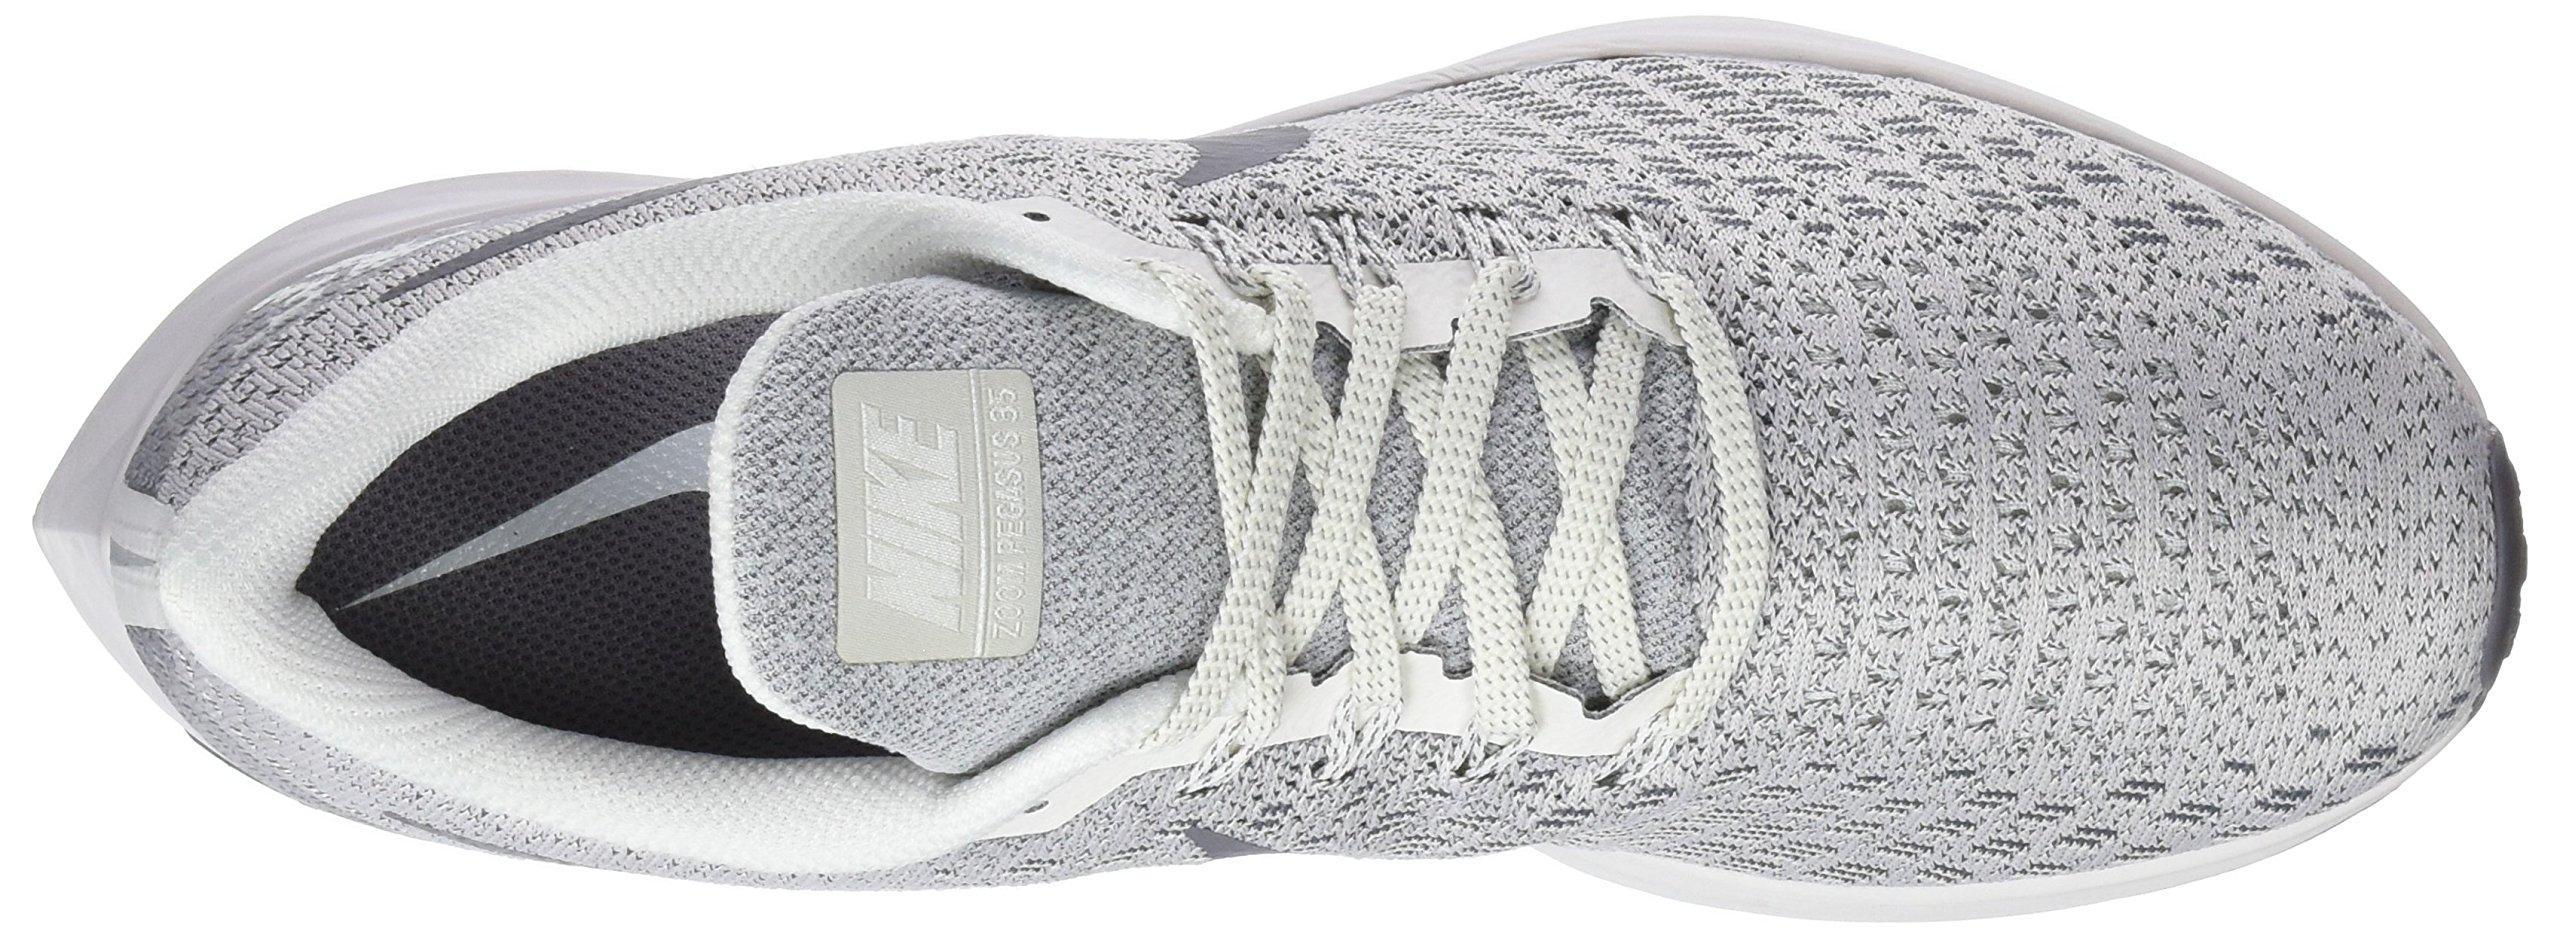 Nike Air Zoom Pegasus 35 Mens 942851-004 Size 6.5 by Nike (Image #7)